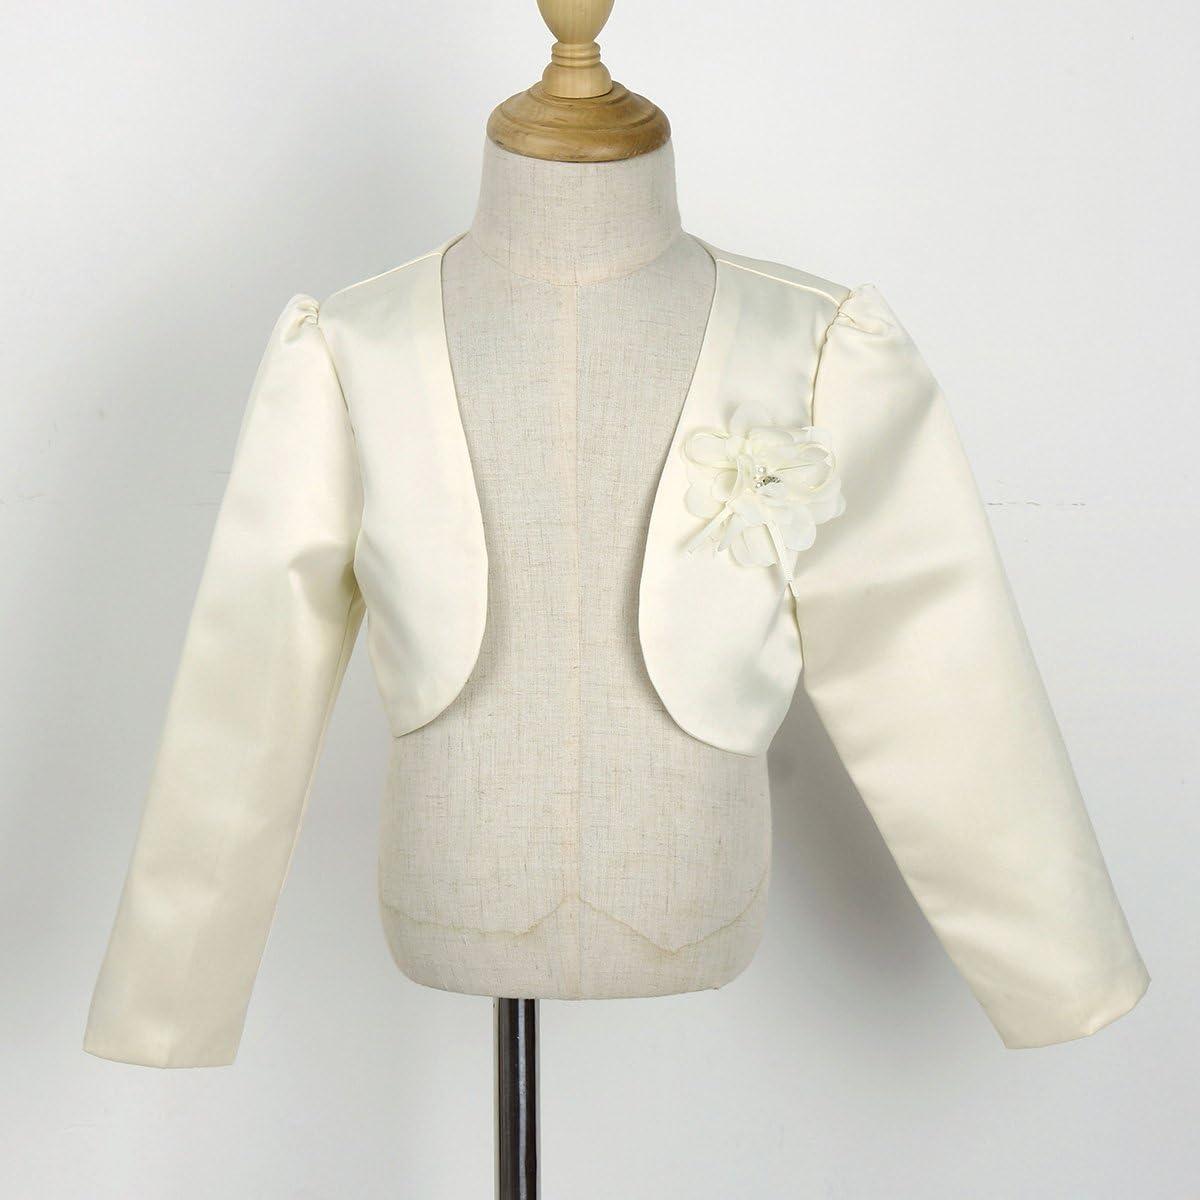 YOOJIA Kids Baby Flower Girl Long Sleeves Bolero Cardigan Shrug Jacket Bridesmaid Party Formal Dress Cover Up